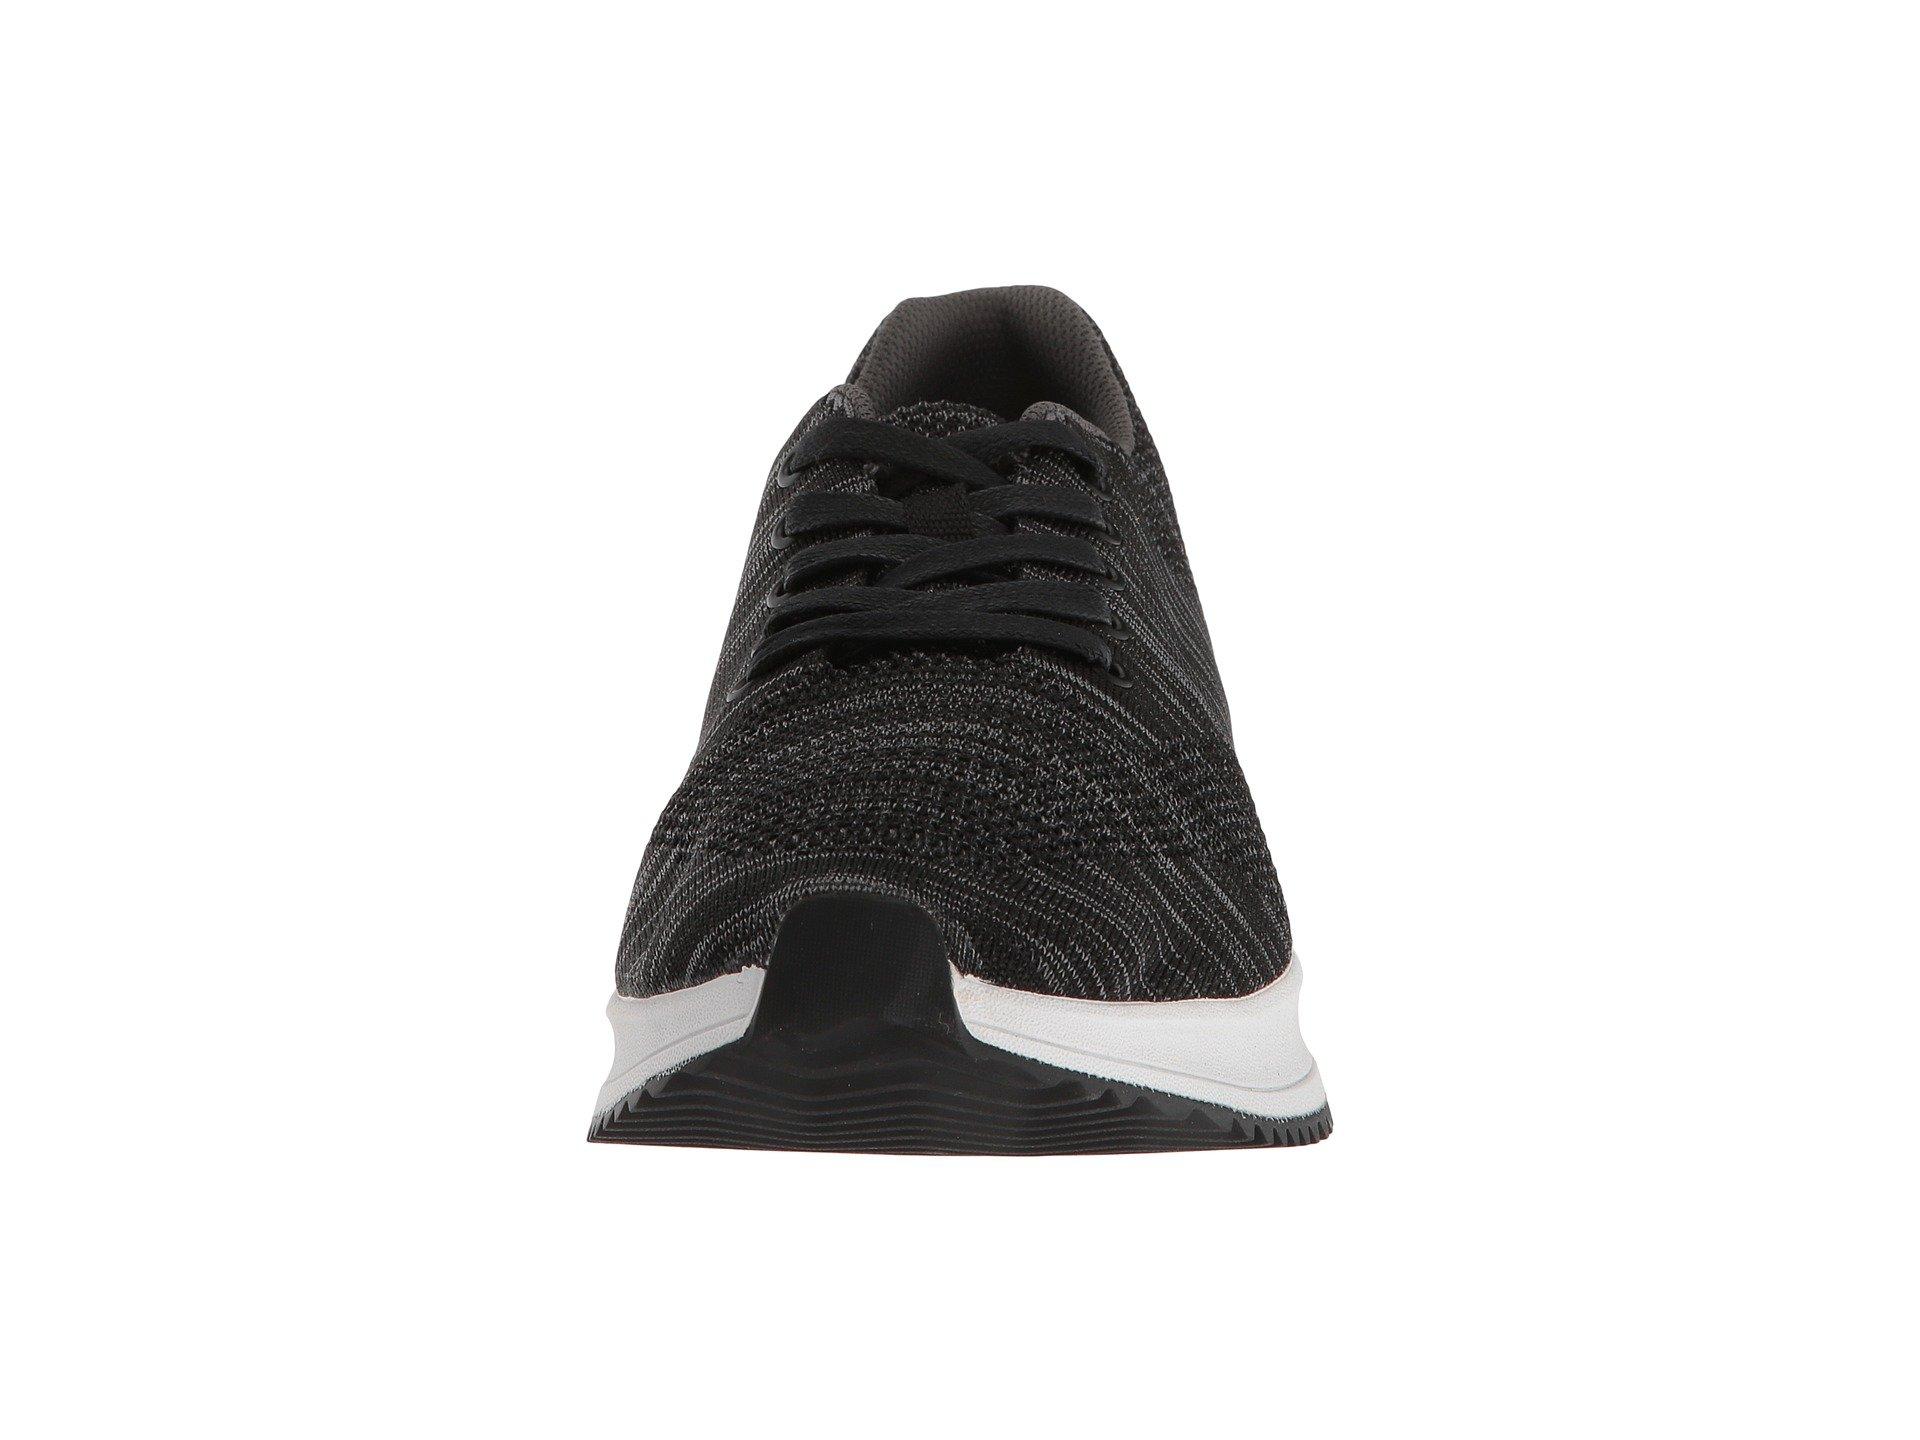 Too Black grey Knit Freewaters Trainer Boy Tall q0zYF